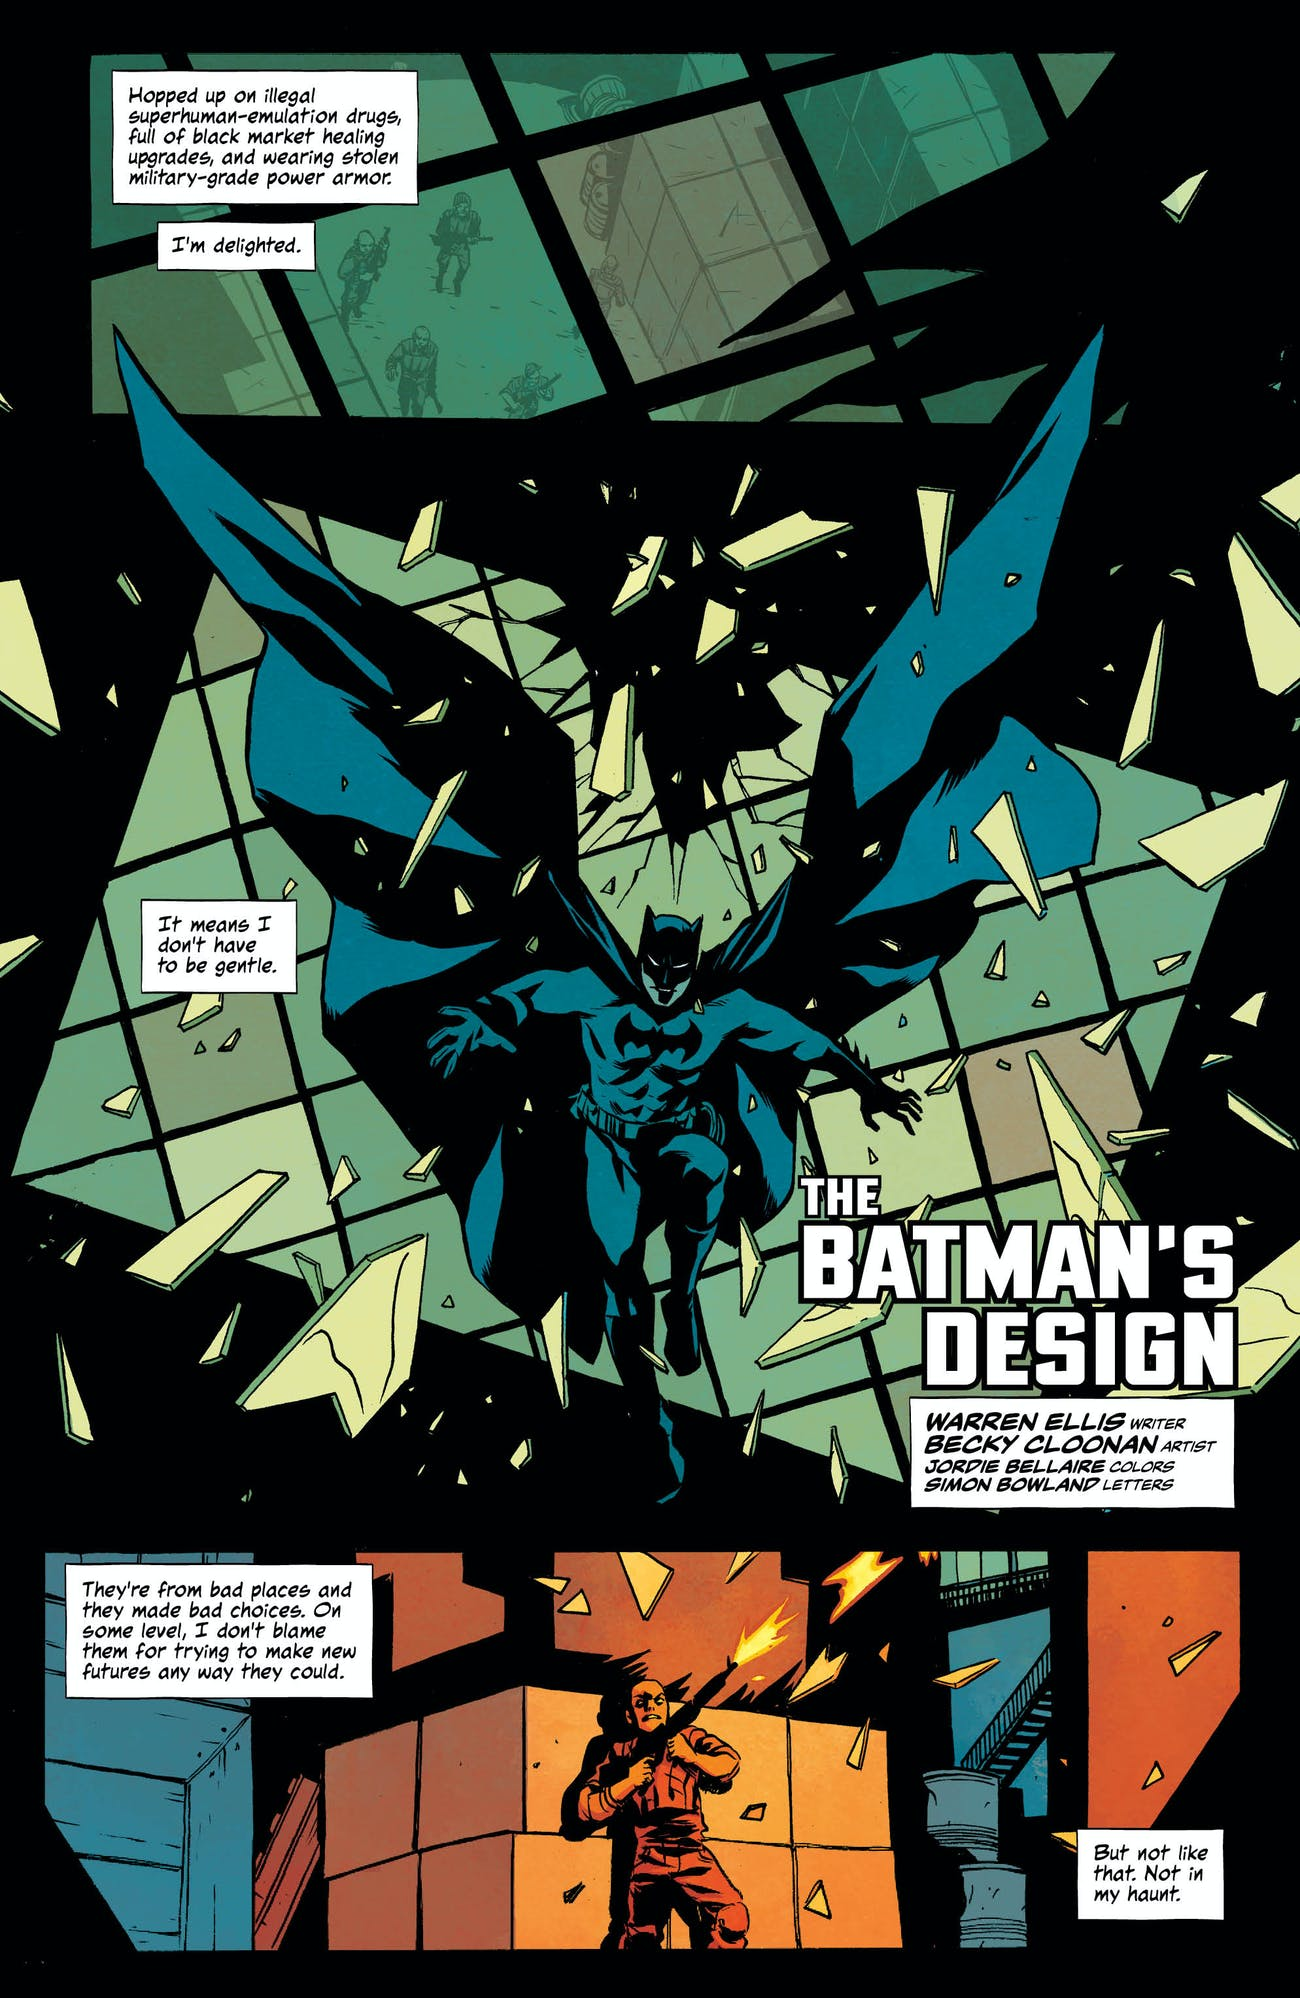 Detective Comics 1000': Batman Reclaims the Gun That Killed